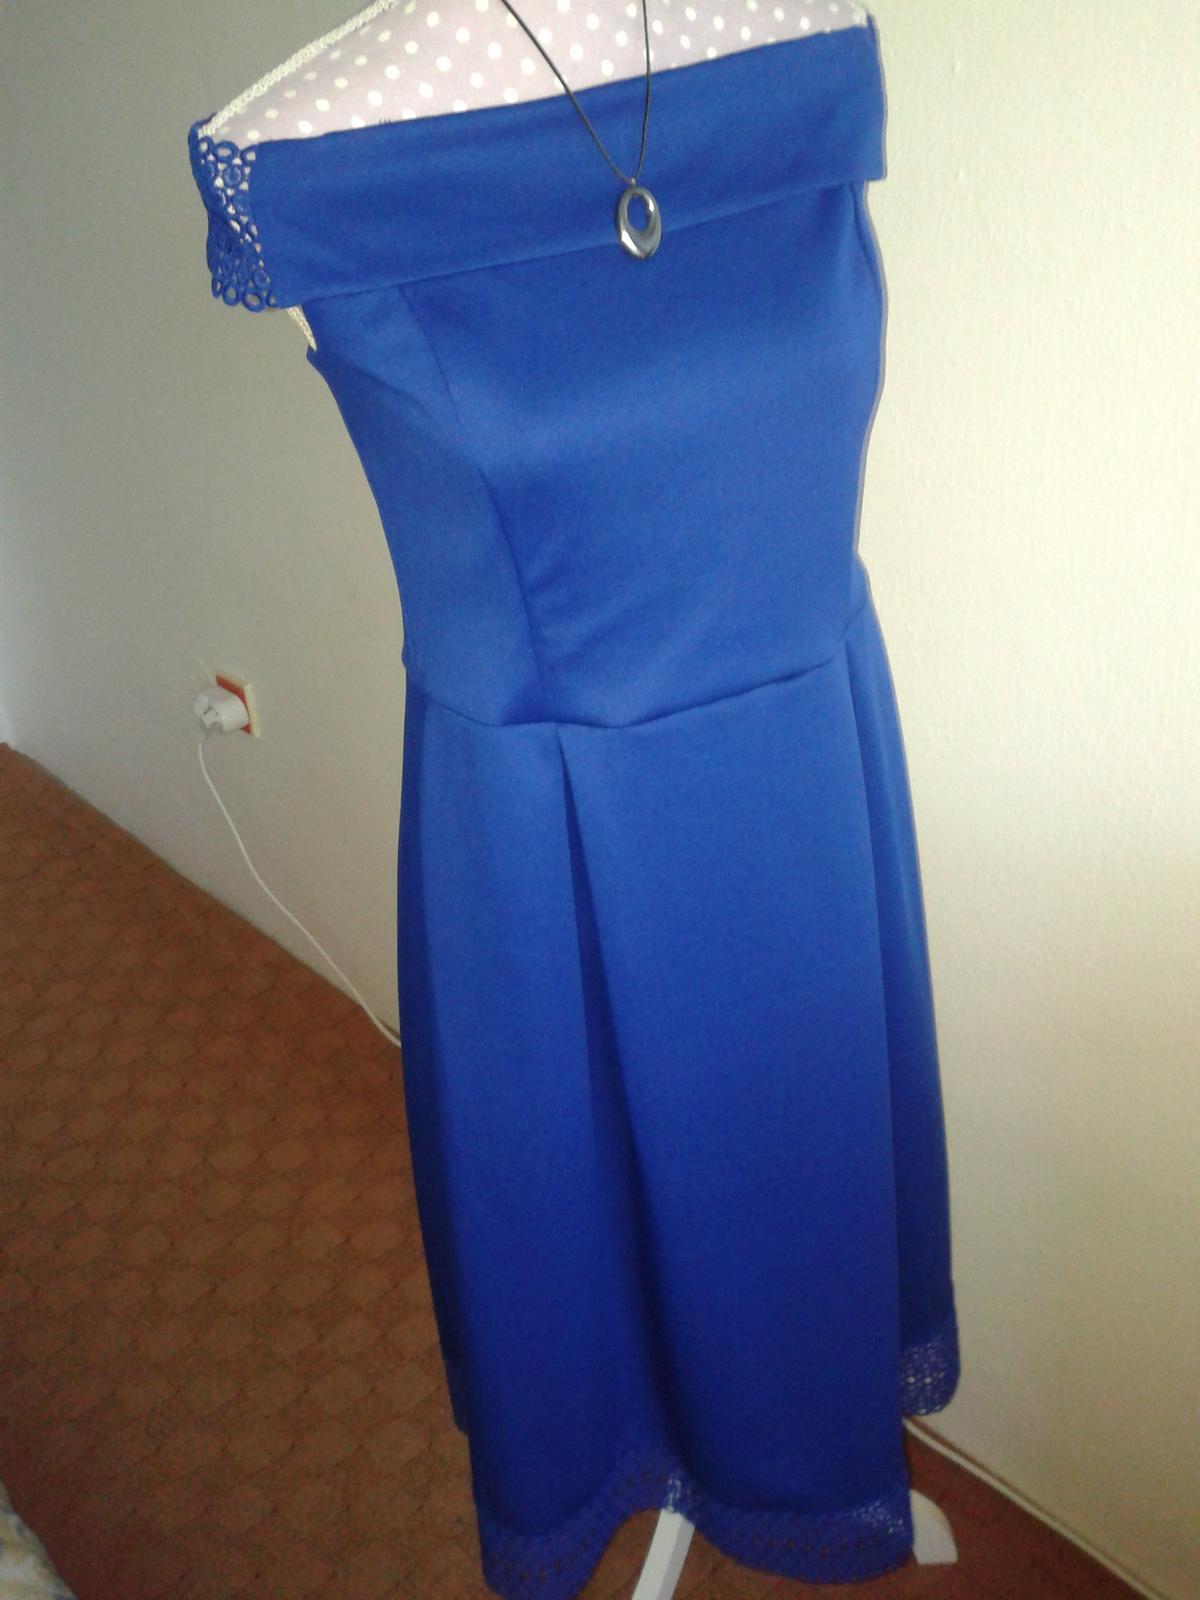 jasnomodré šaty cez ramená Dorothy Perkins veľ. L/42 - Obrázok č. 1